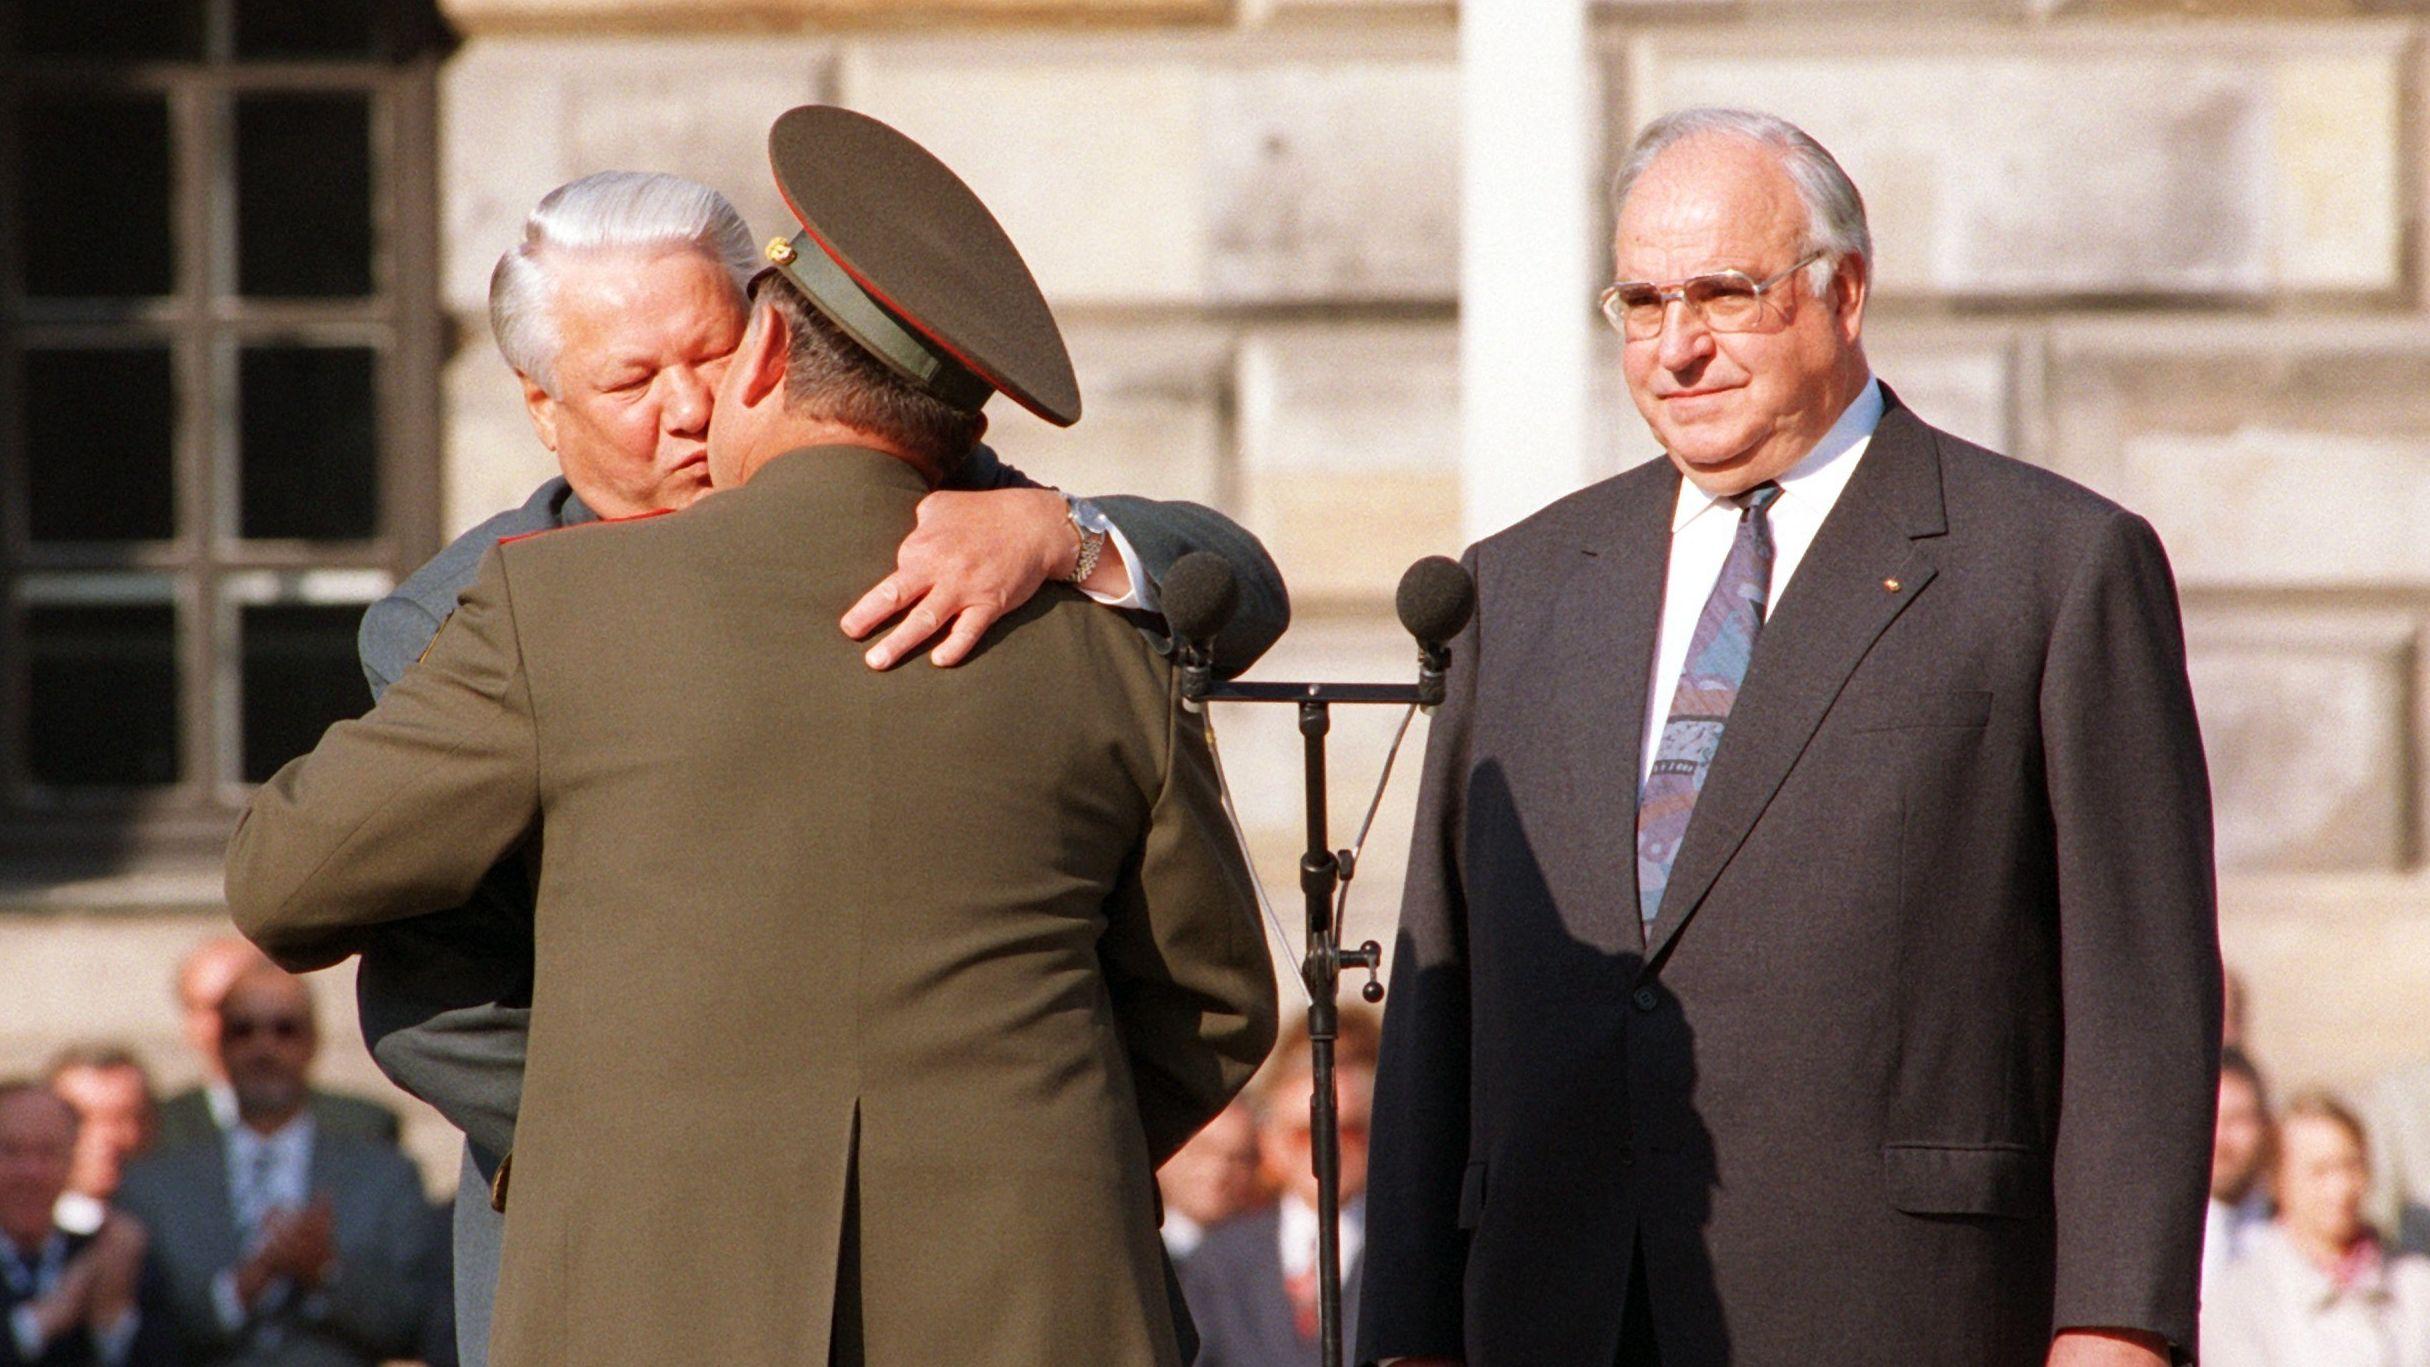 1994: Boris Jelzin verabschiedet den Oberkommanduierenden der sowjetischen Streitkräfte in Berlin.